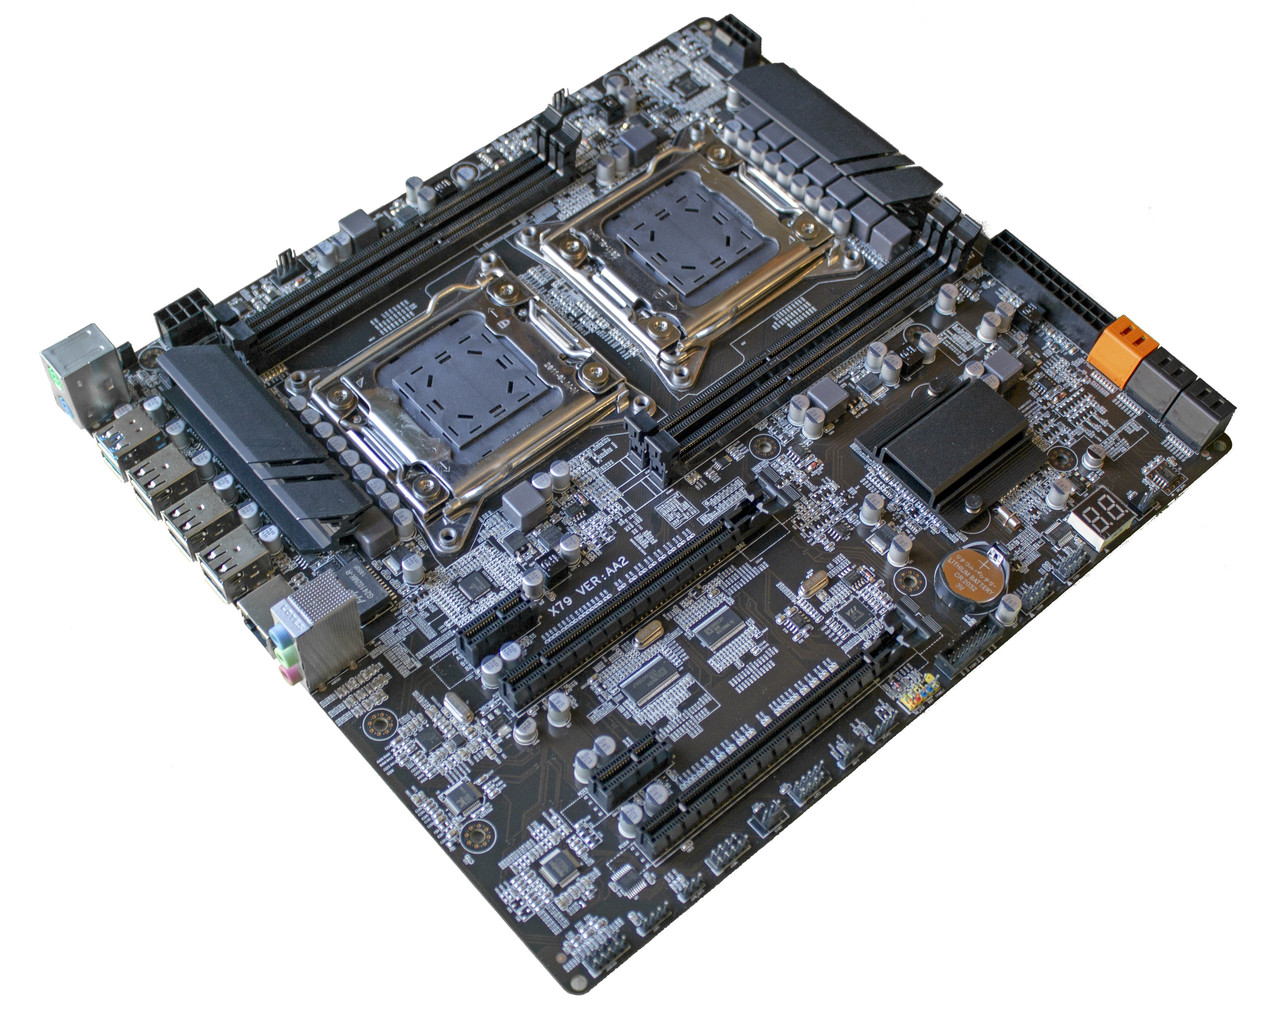 Комплект X79-AA2 + 2 х Xeon E5-4620 + 16 GB RAM + Кулер, LGA 2011